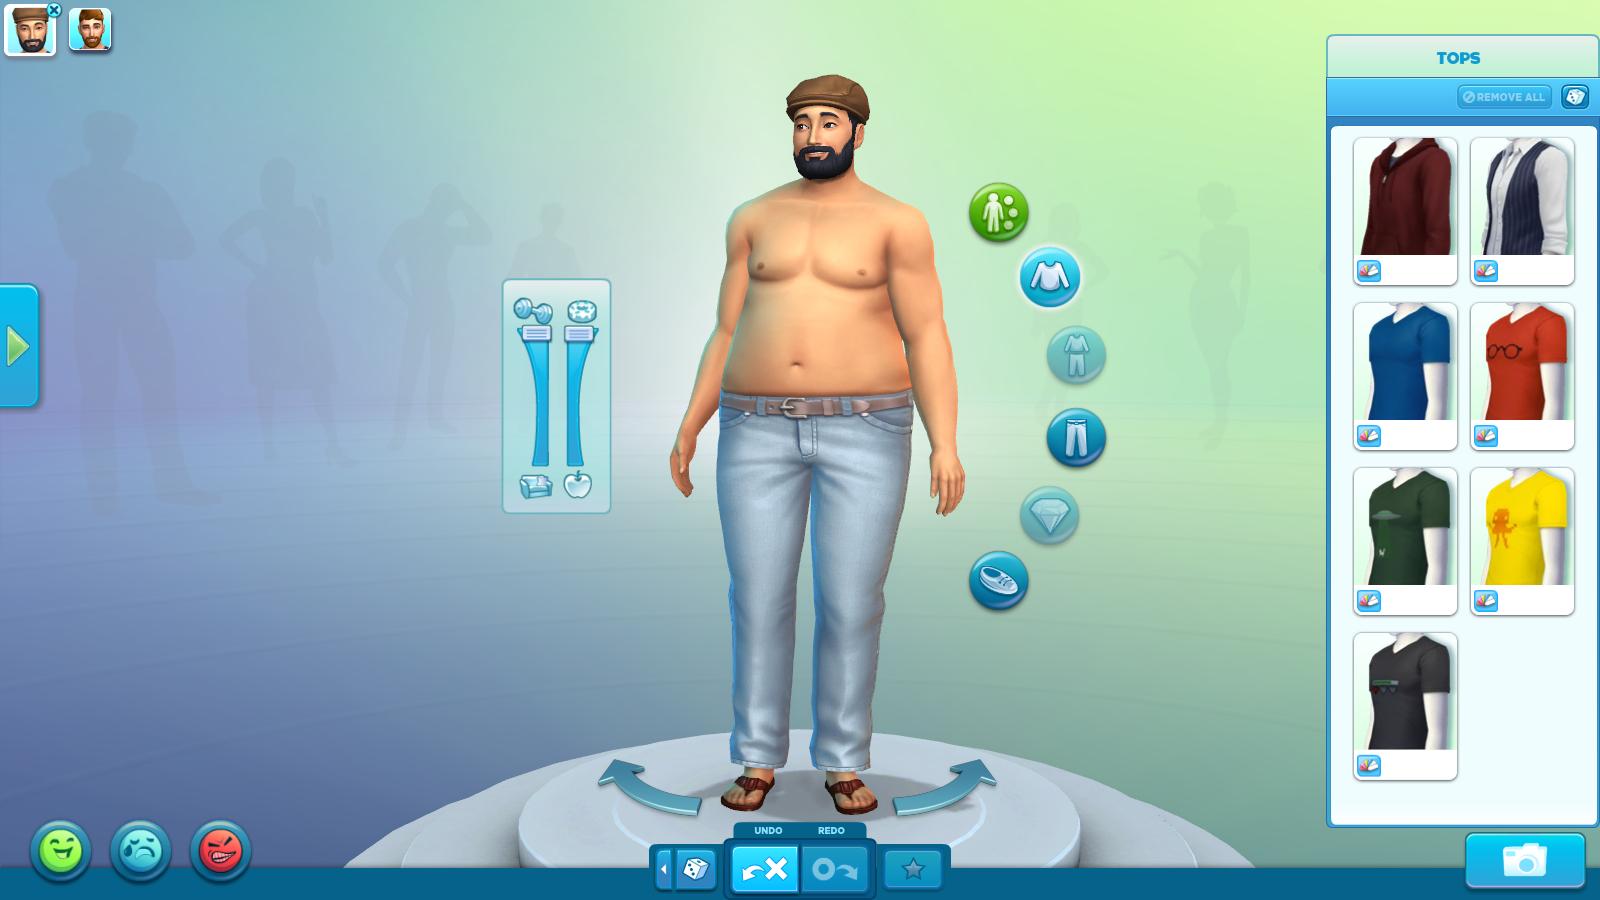 4 körpergröße cheat sims ändern Sims 4